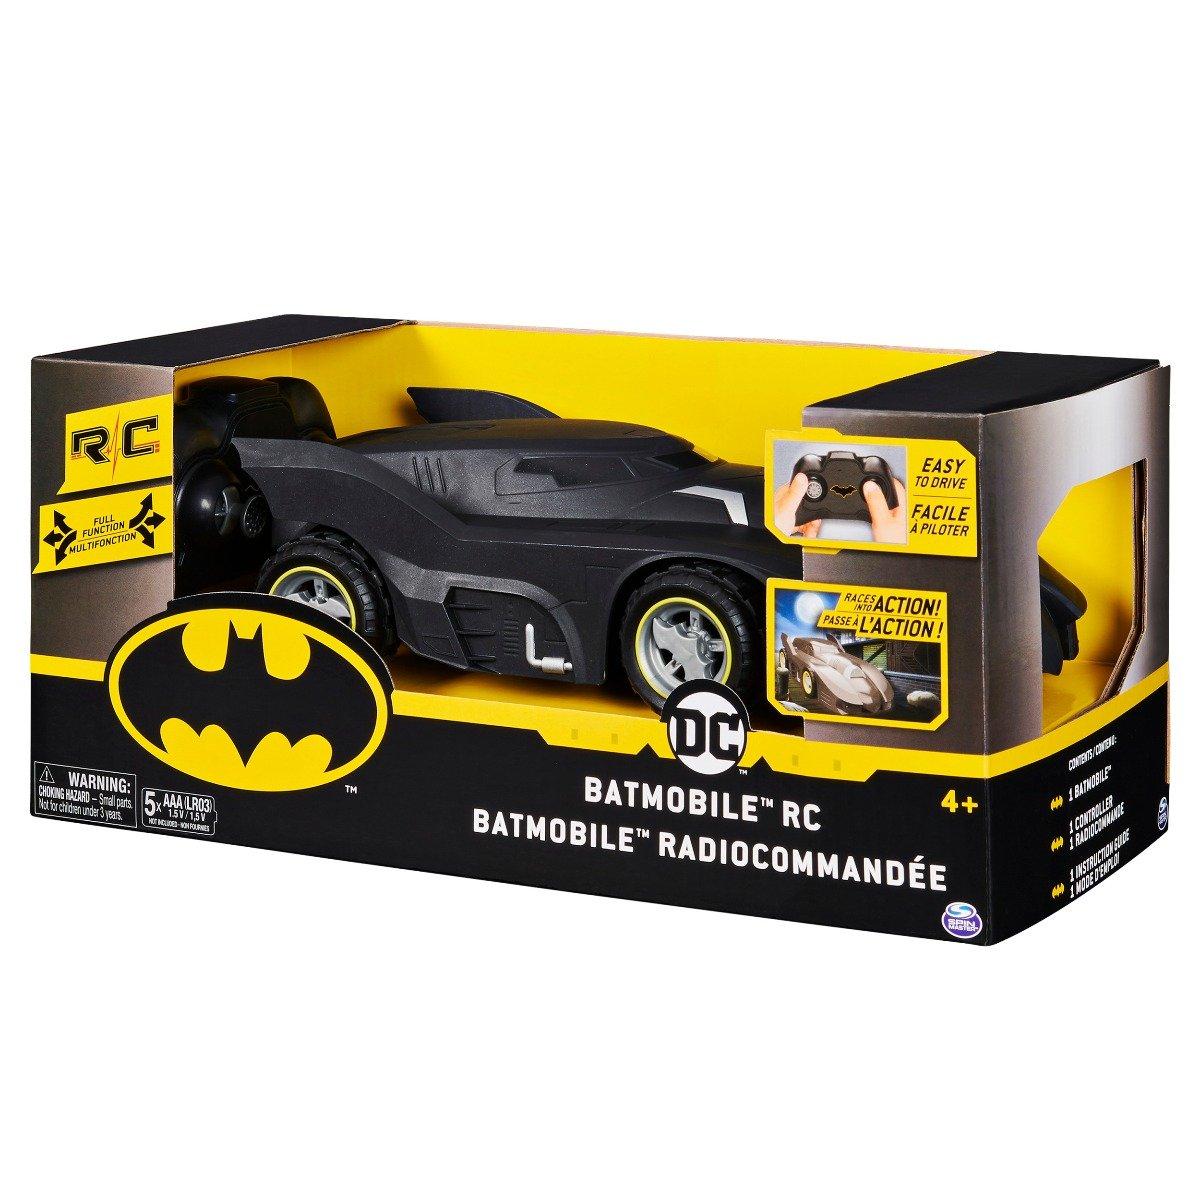 Masinuta cu telecomanda Batman, Batmobile, 1:20